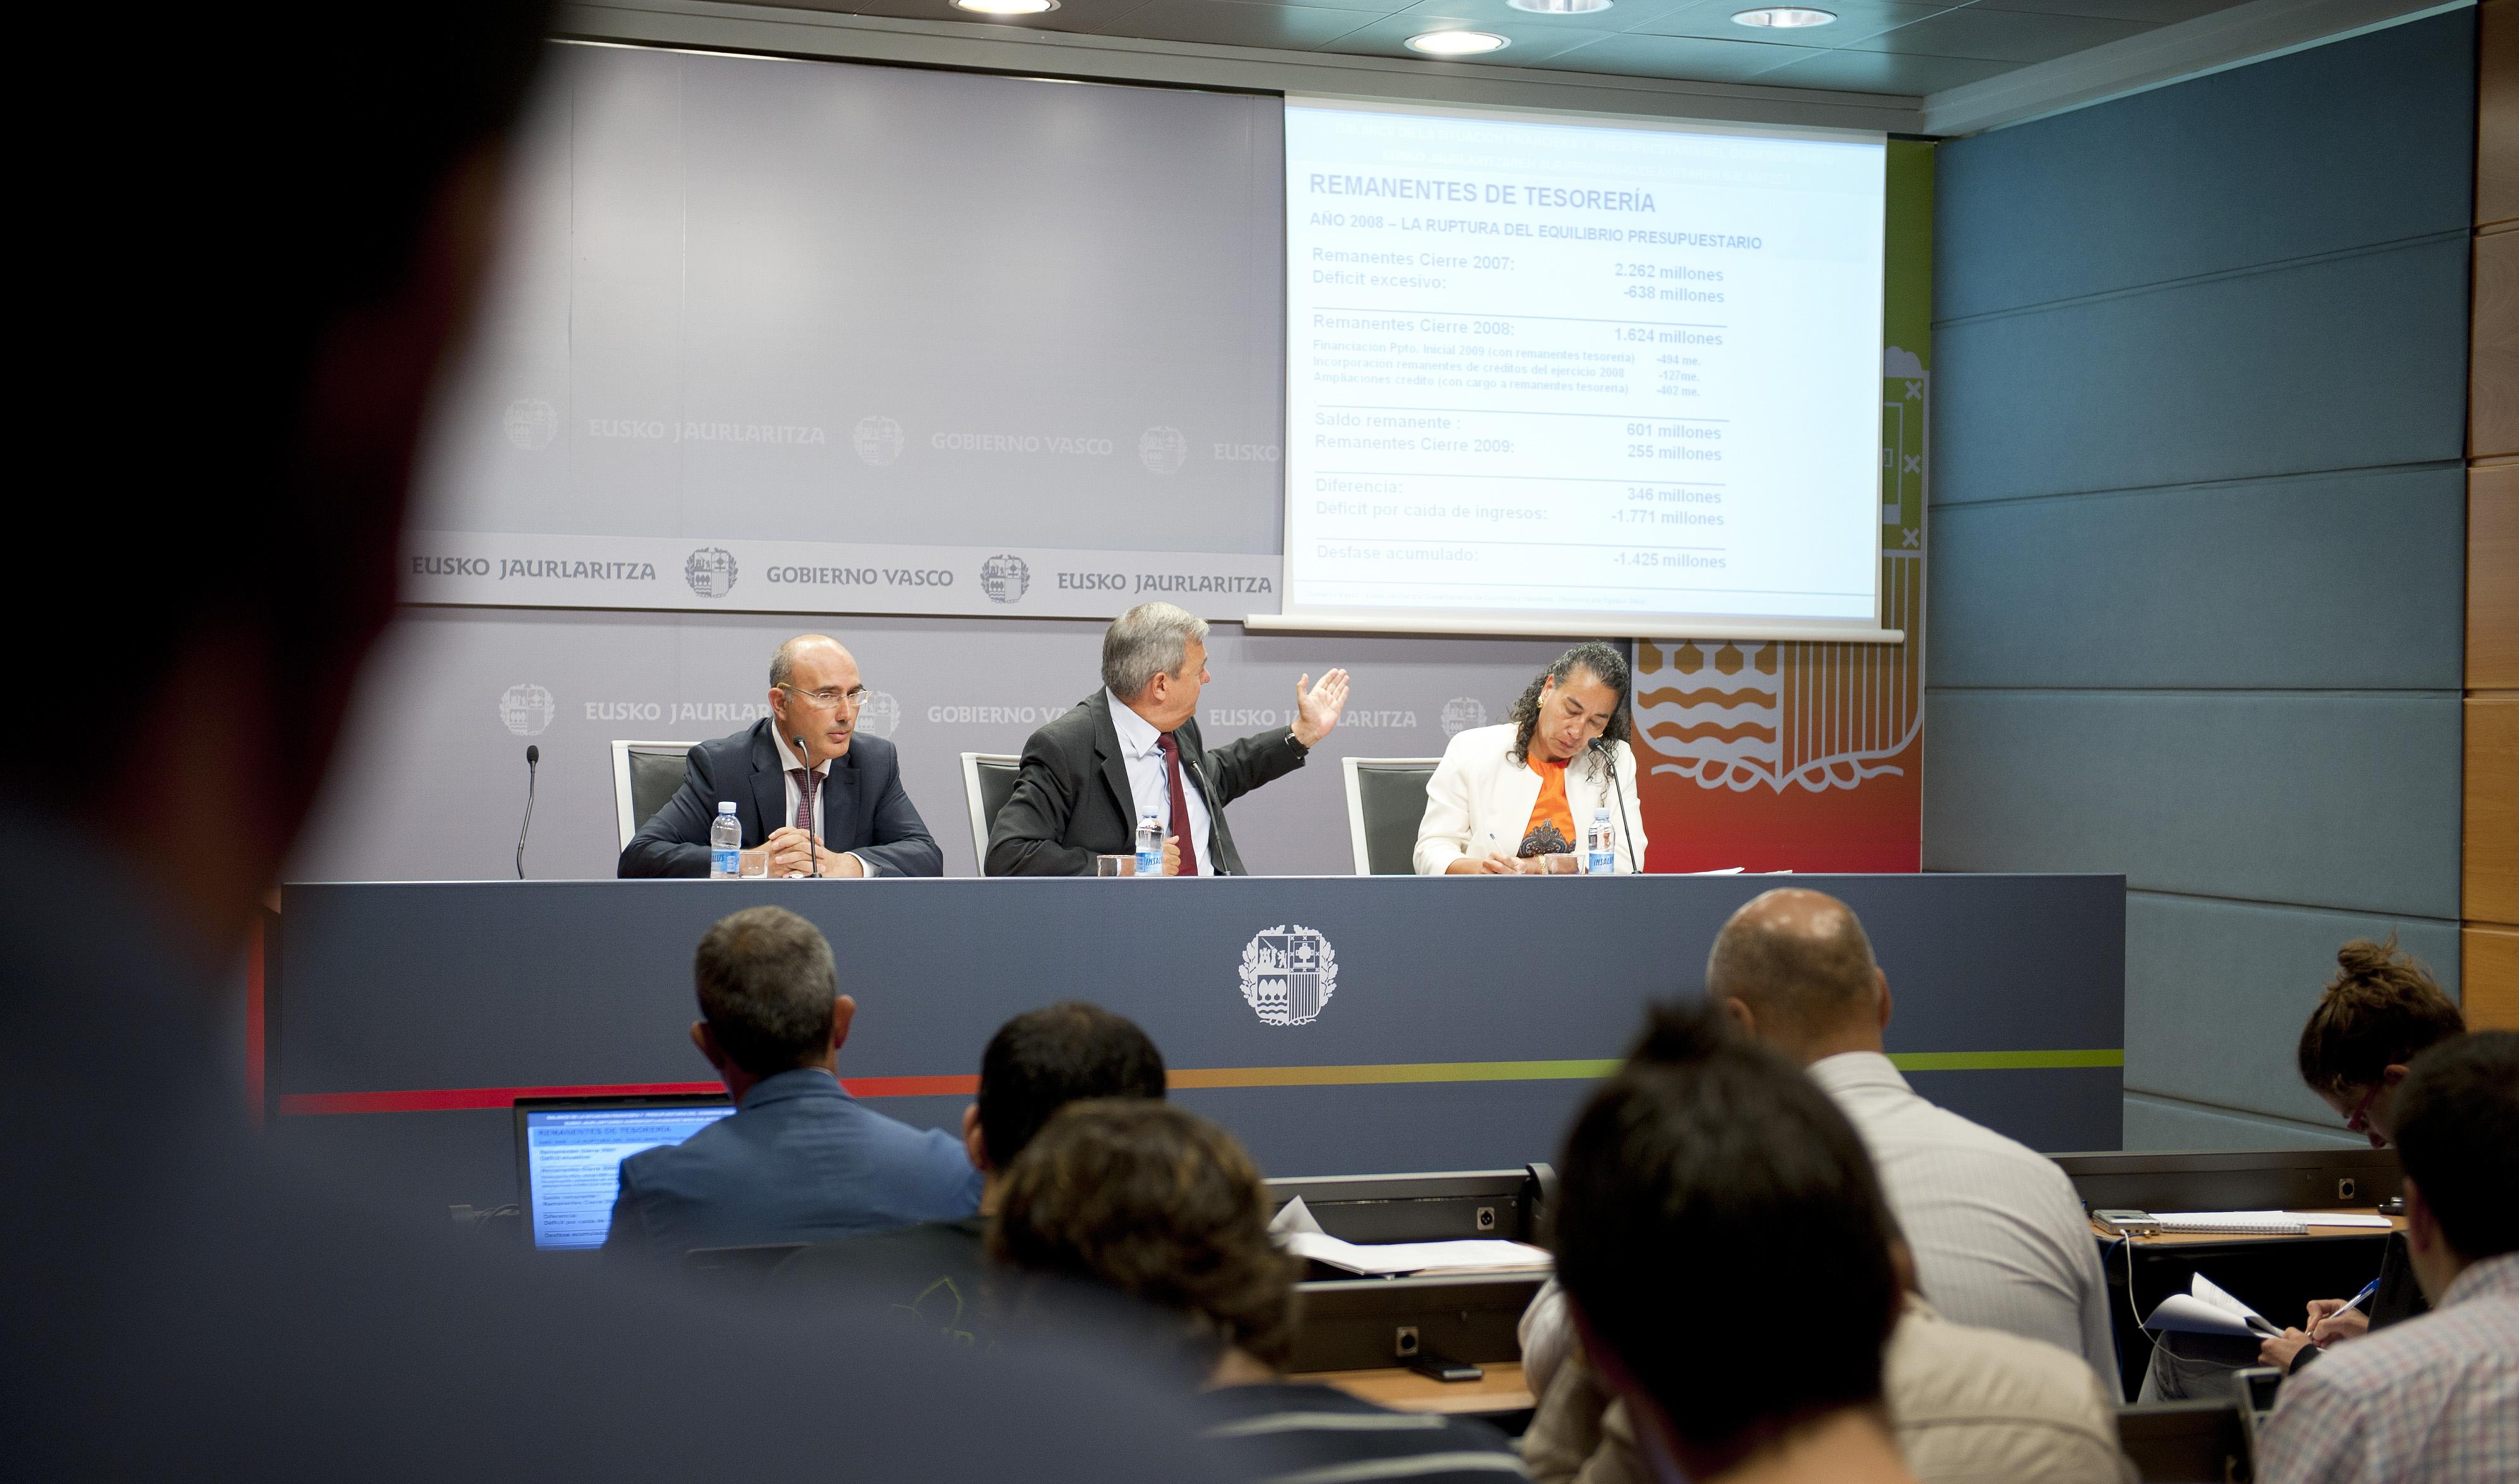 2012_08_30_aguirre_medidas_finanzas06.jpg